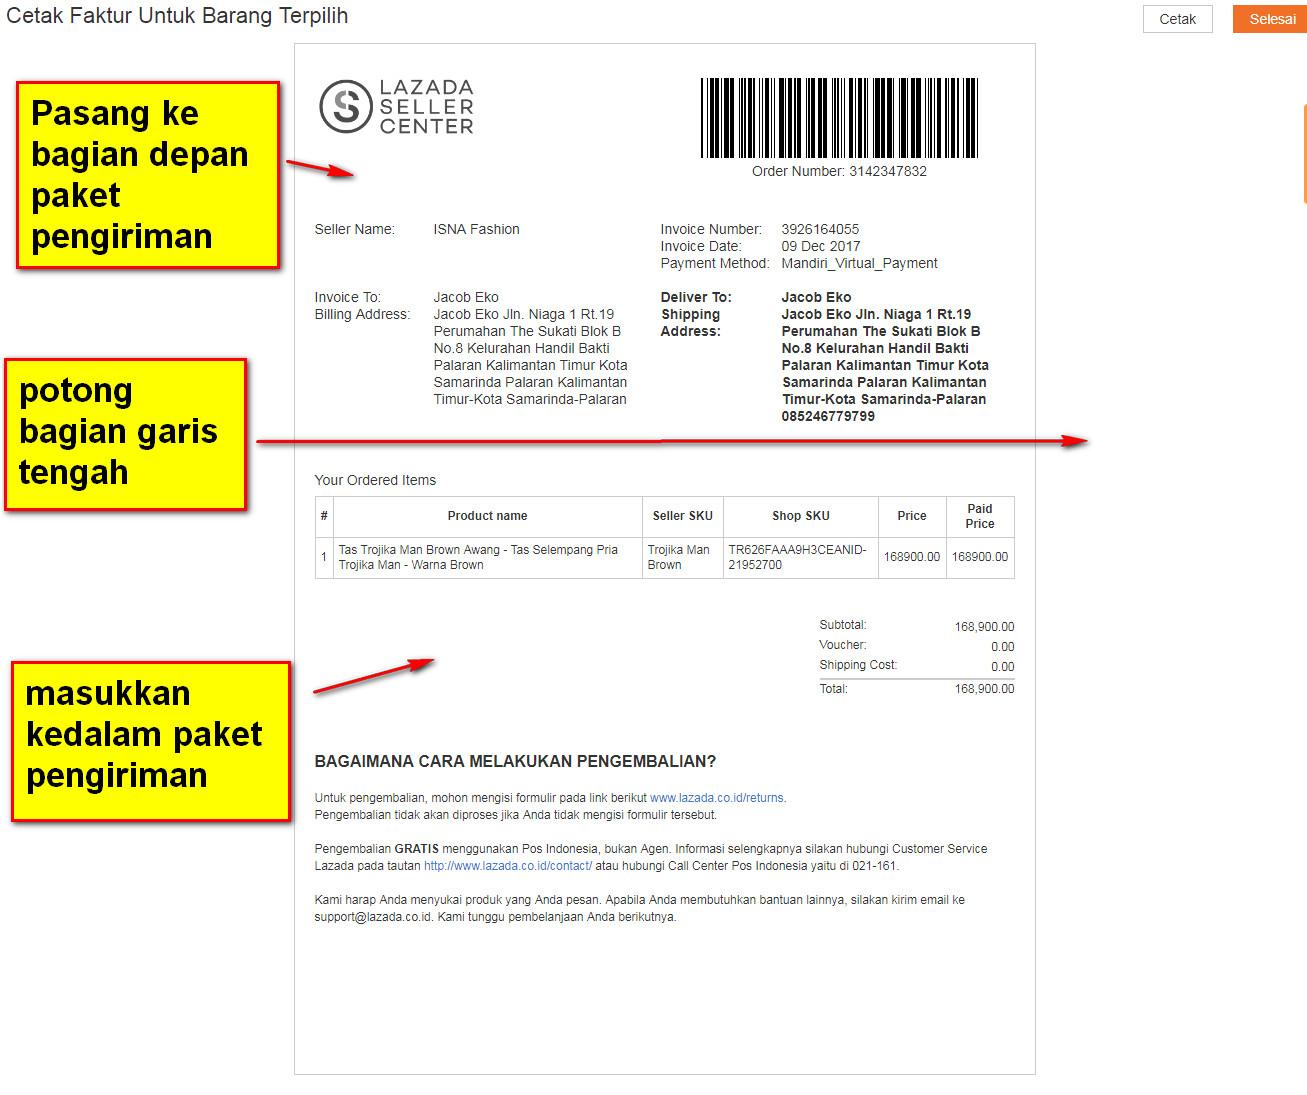 Cara Cetak Invoice Orderan Penjualan Di Lazada Cemiti